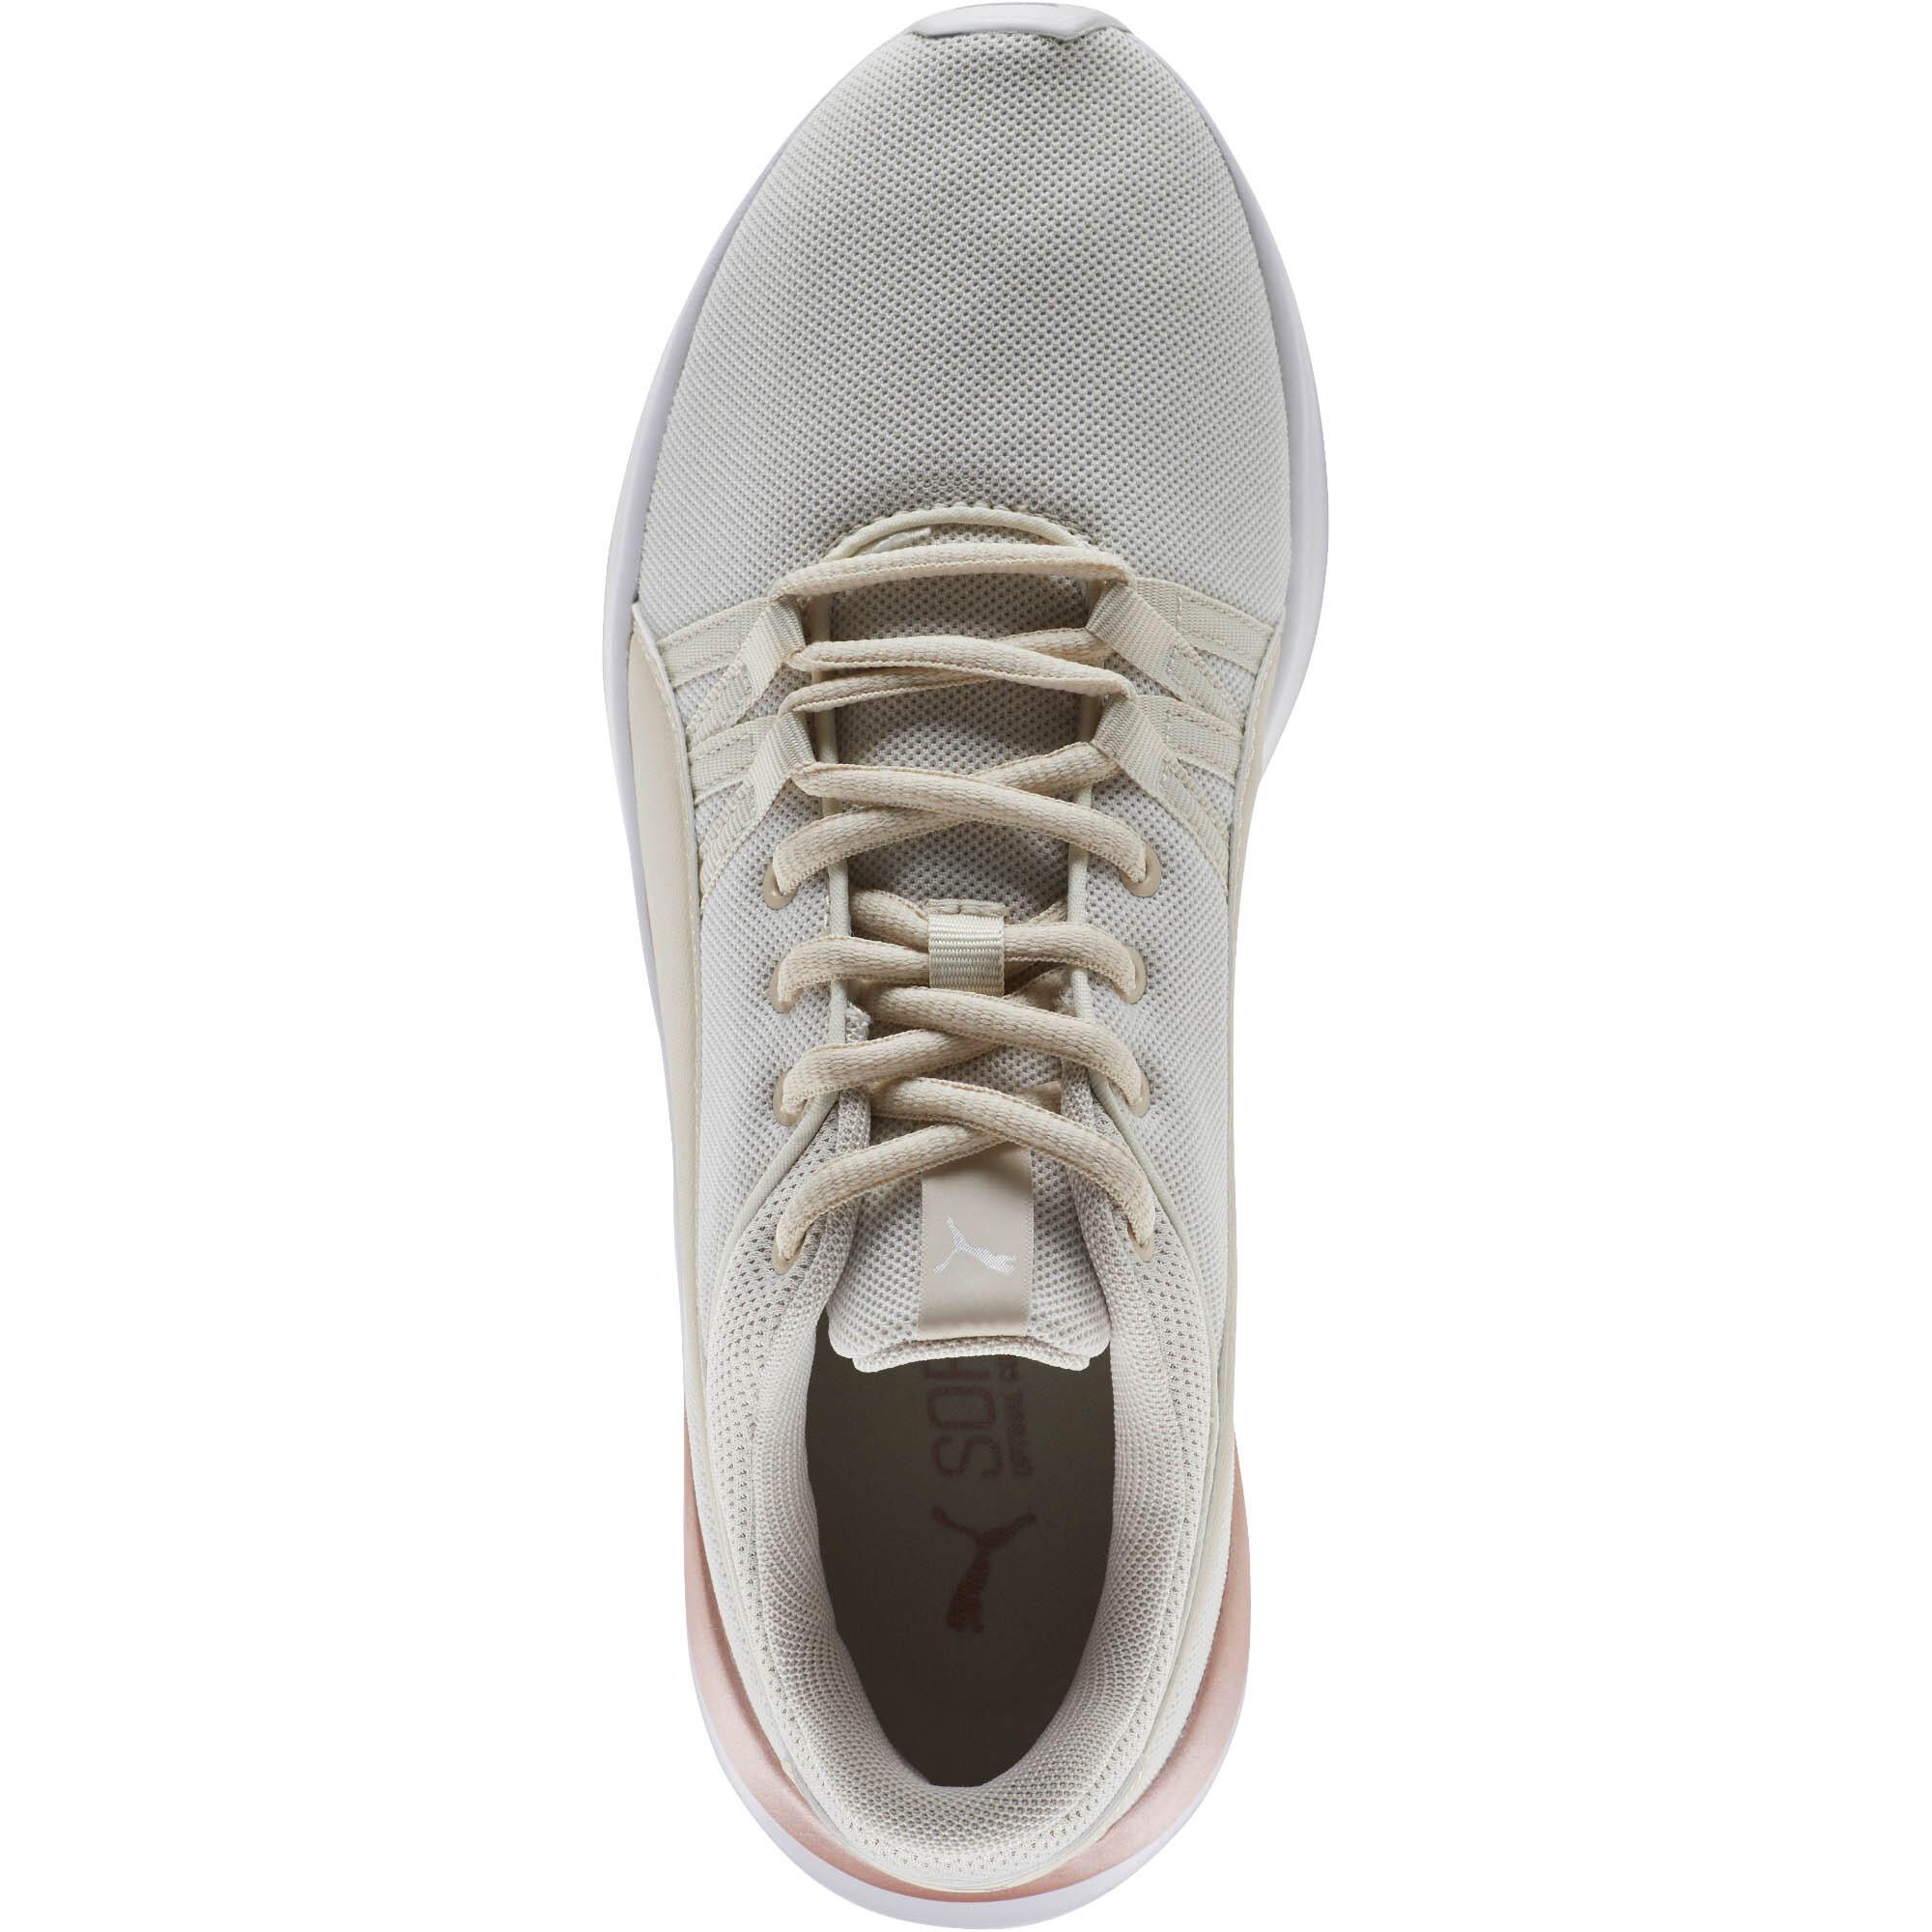 PUMA-Adela-Mesh-Women-s-Sneakers-Women-Shoe-Basics thumbnail 16